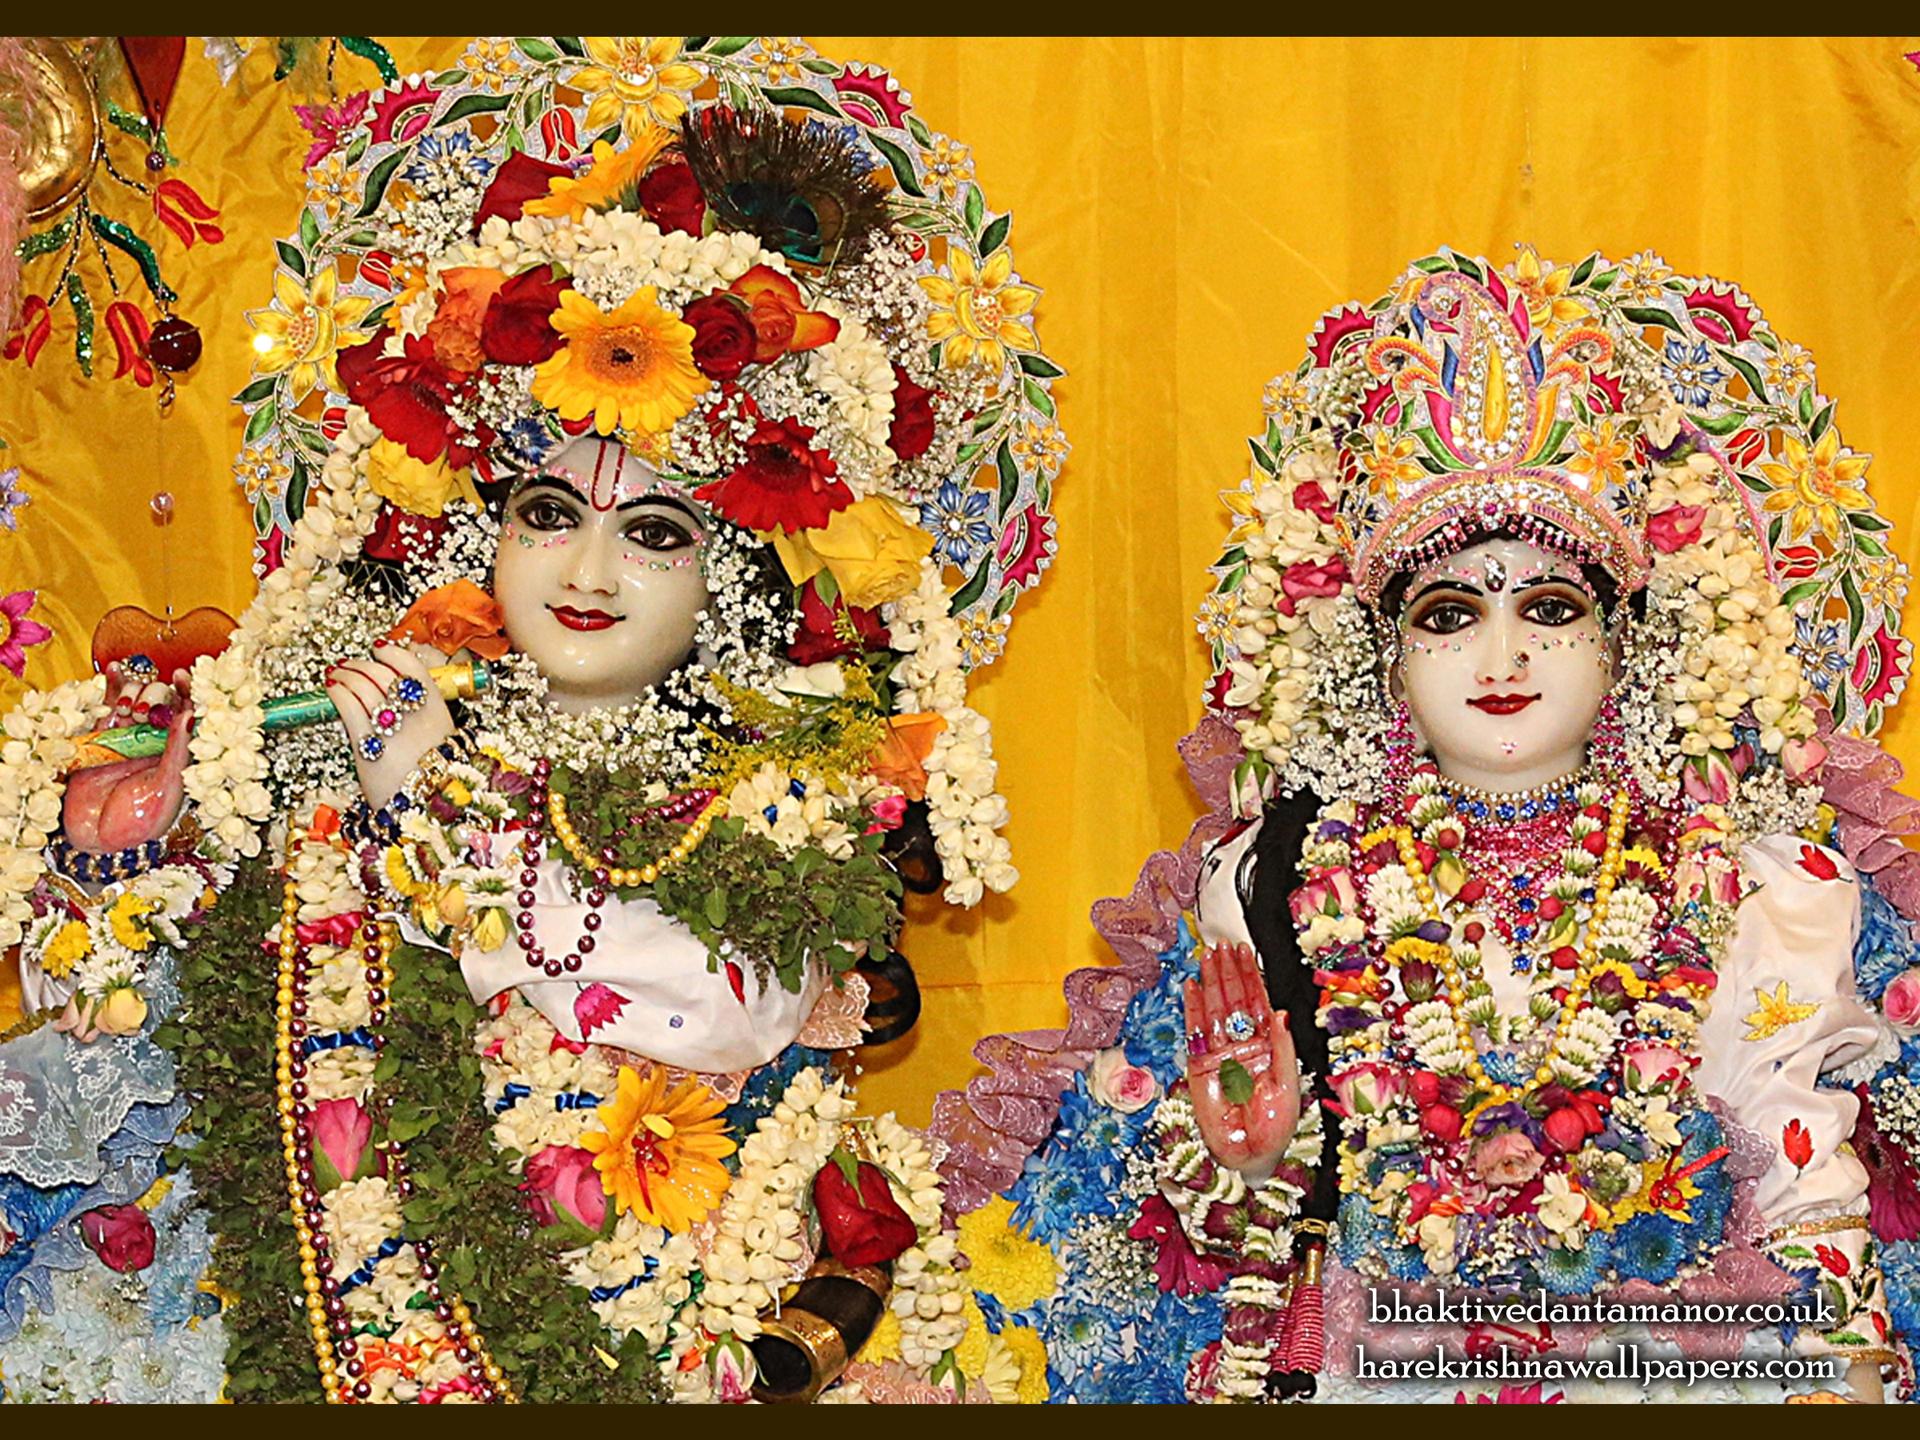 Sri Sri Radha Gokulananda Close up Wallpaper (024) Size 1920x1440 Download